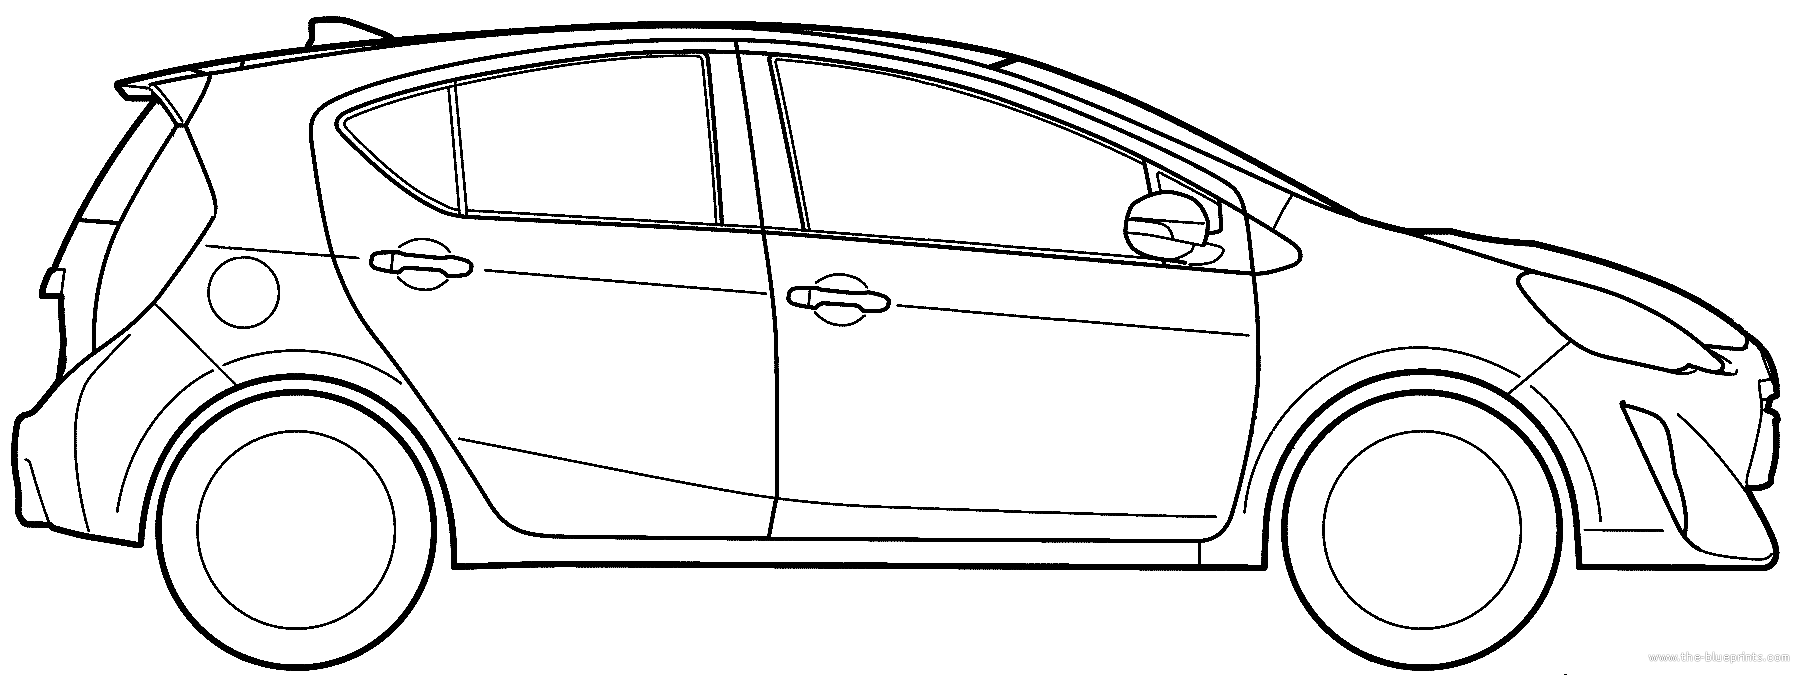 blueprints cars toyota toyota aqua 2014 Toyota 2 Door Cars toyota aqua 2014